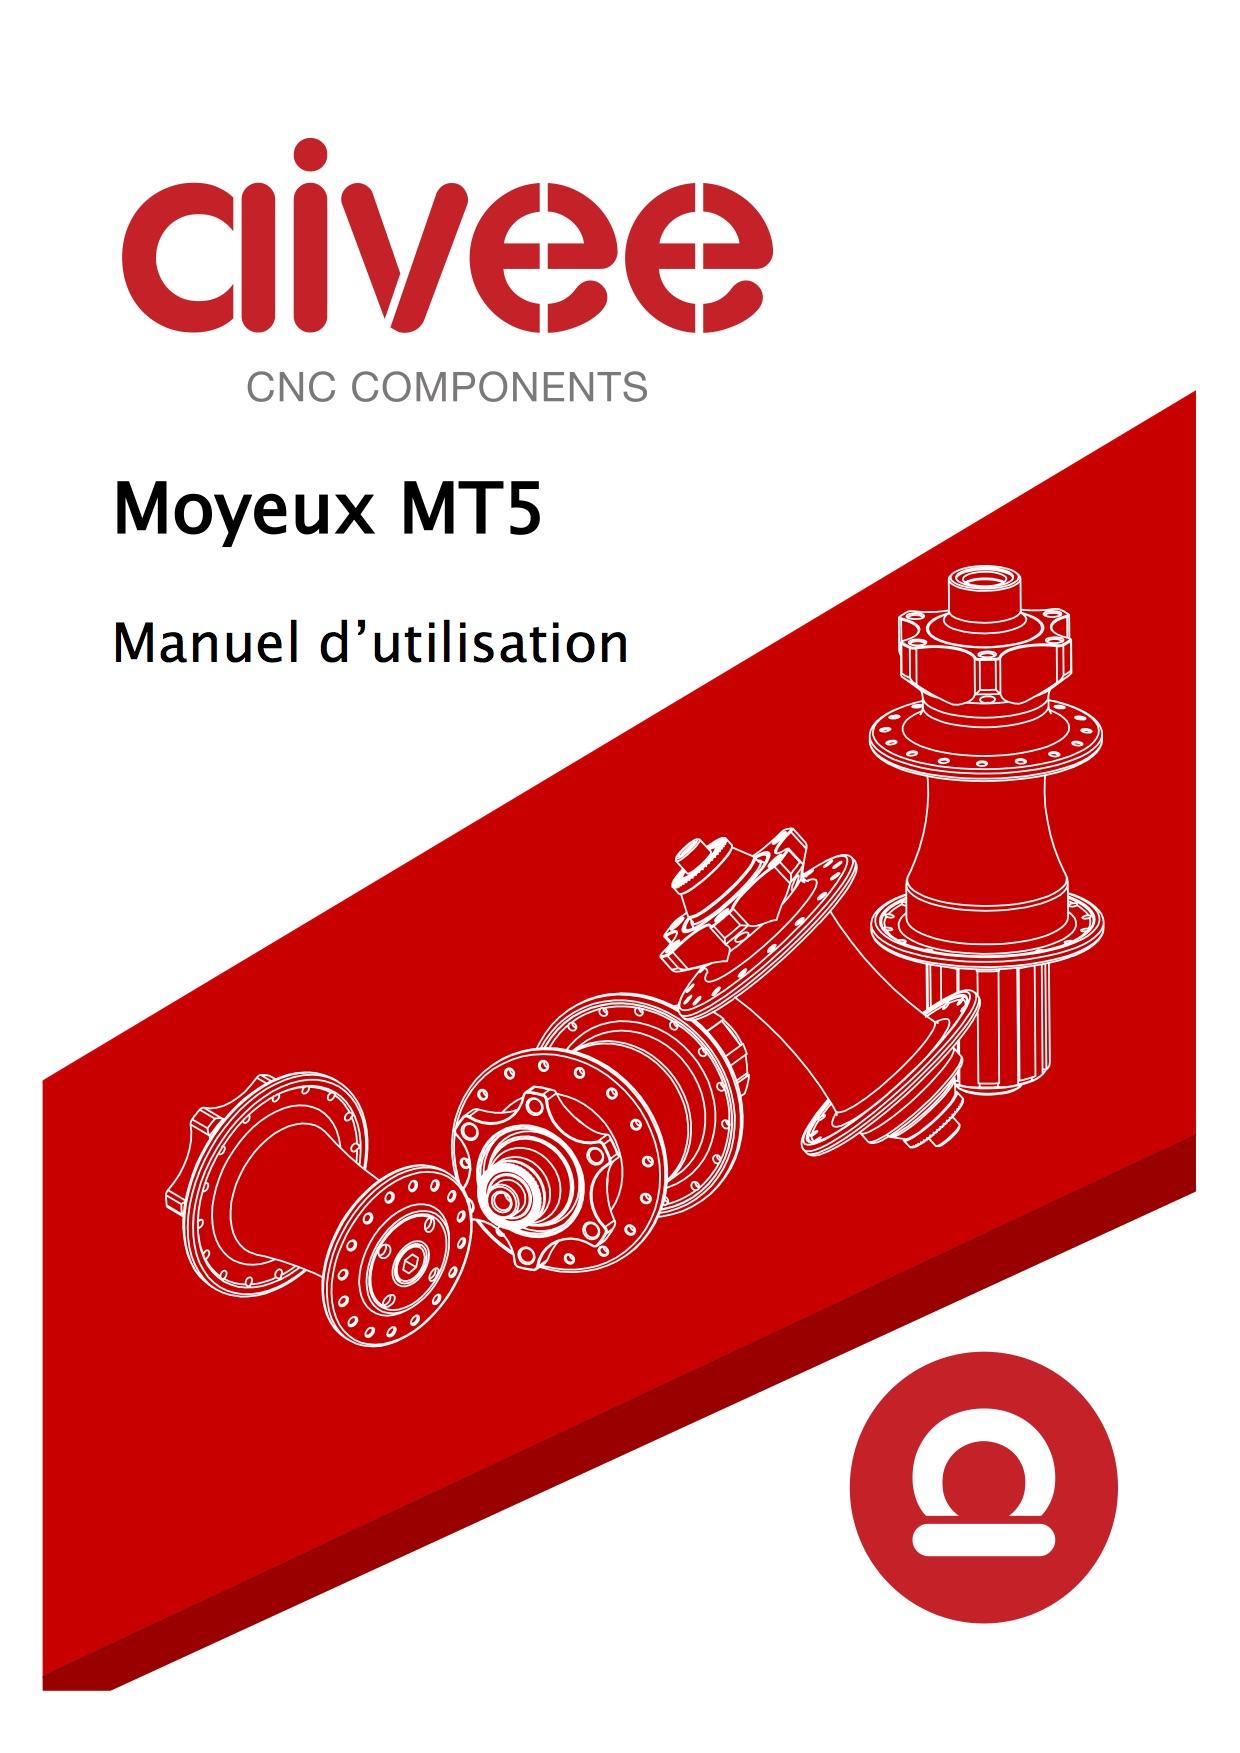 Aivee_MT5_Manuel_dutilisation .jpg